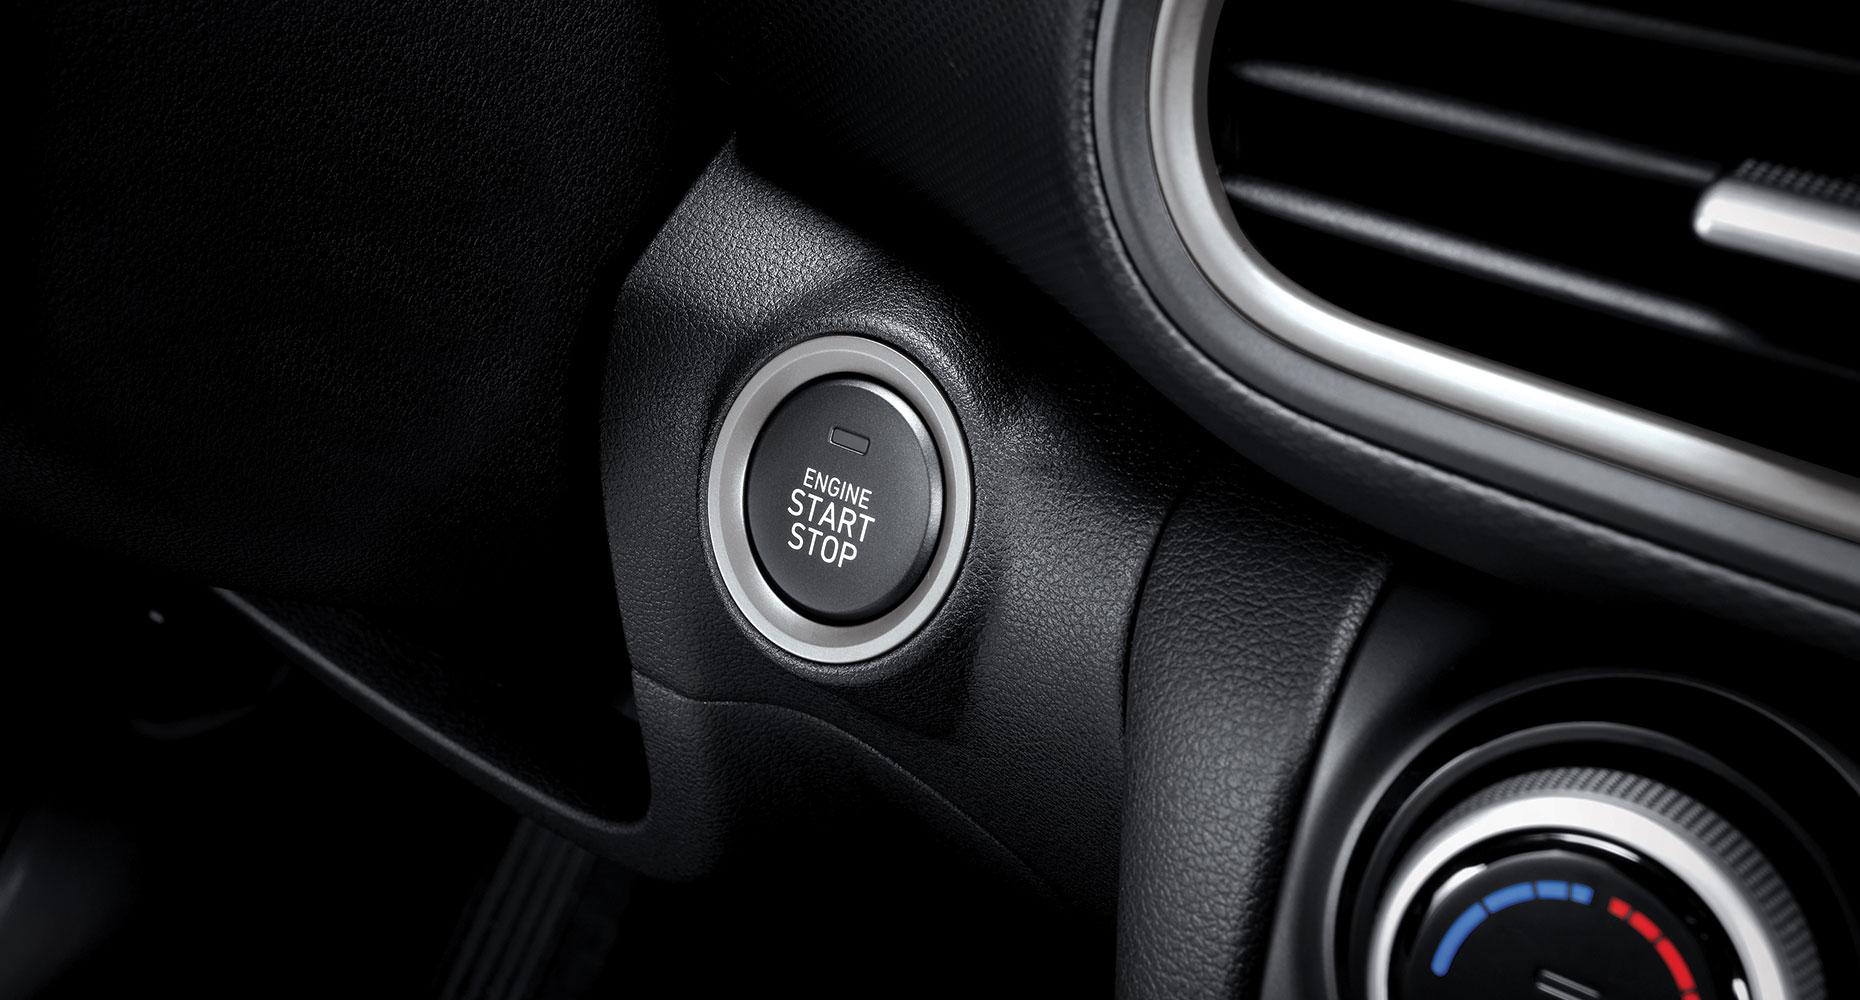 2019 Hyundai KONA | SUV Crossover Utility Vehicle | Hyundai Canada